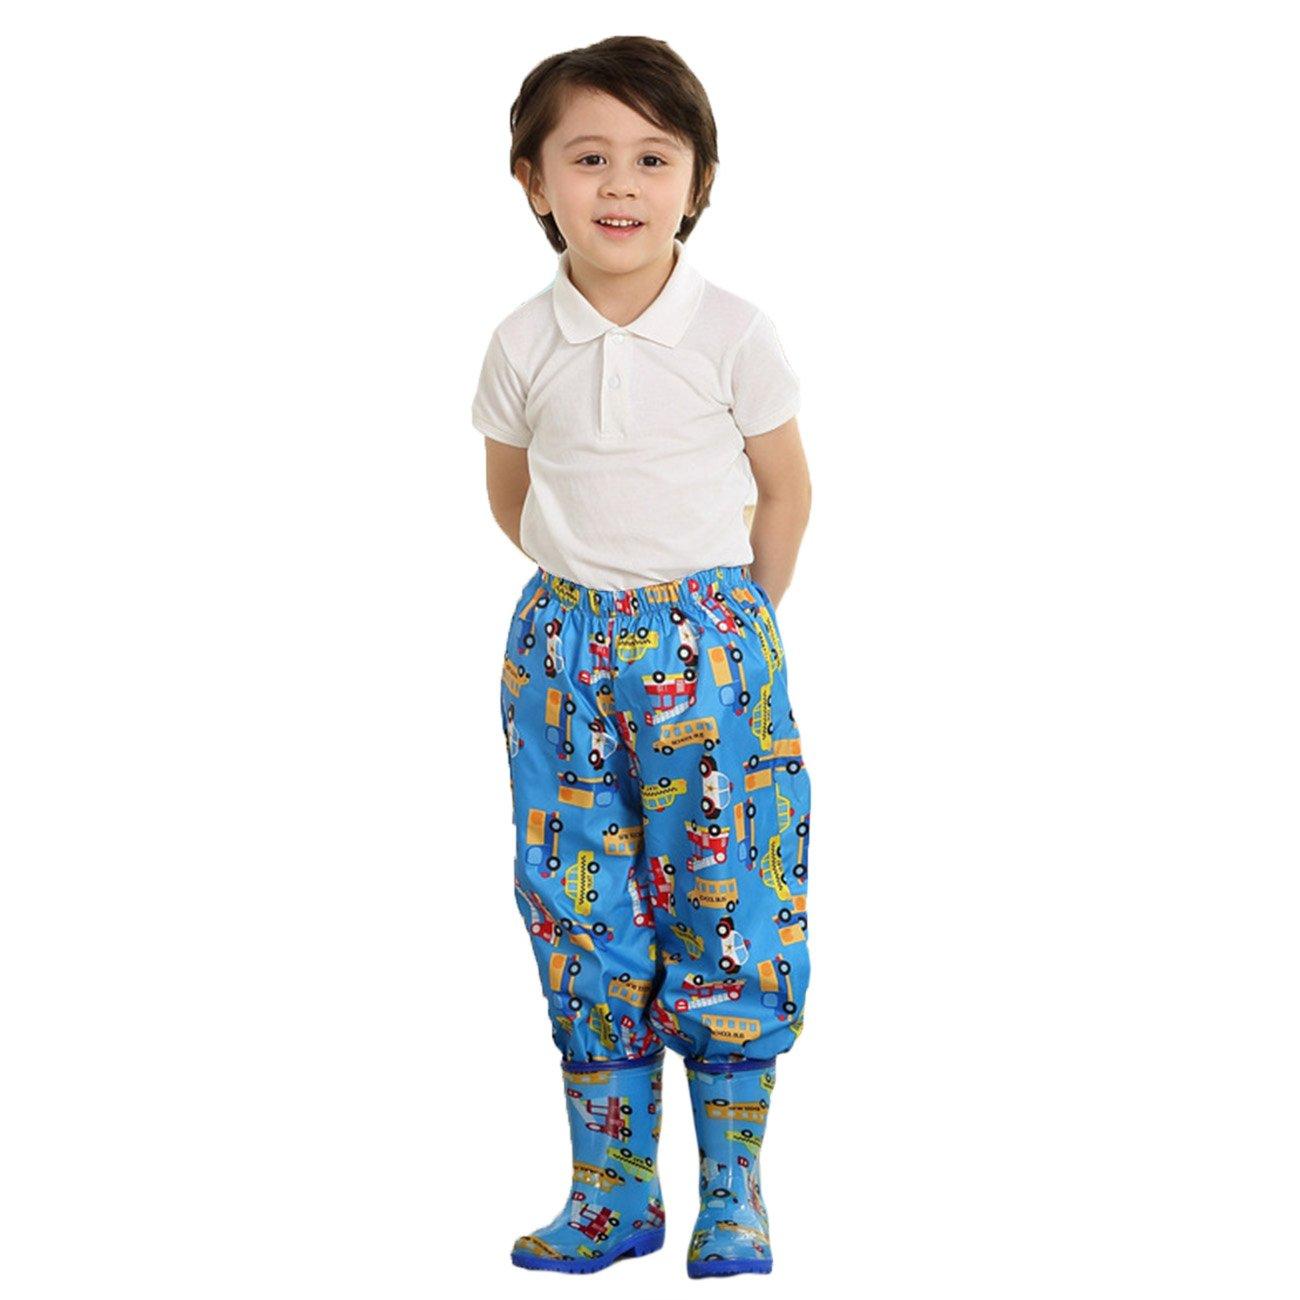 Lemonkid® Kids Boys Girls Waterproof Rain Pants Trouser Cartoon Print Pink M Fit 6-8T Faddist Spark Malls-CA